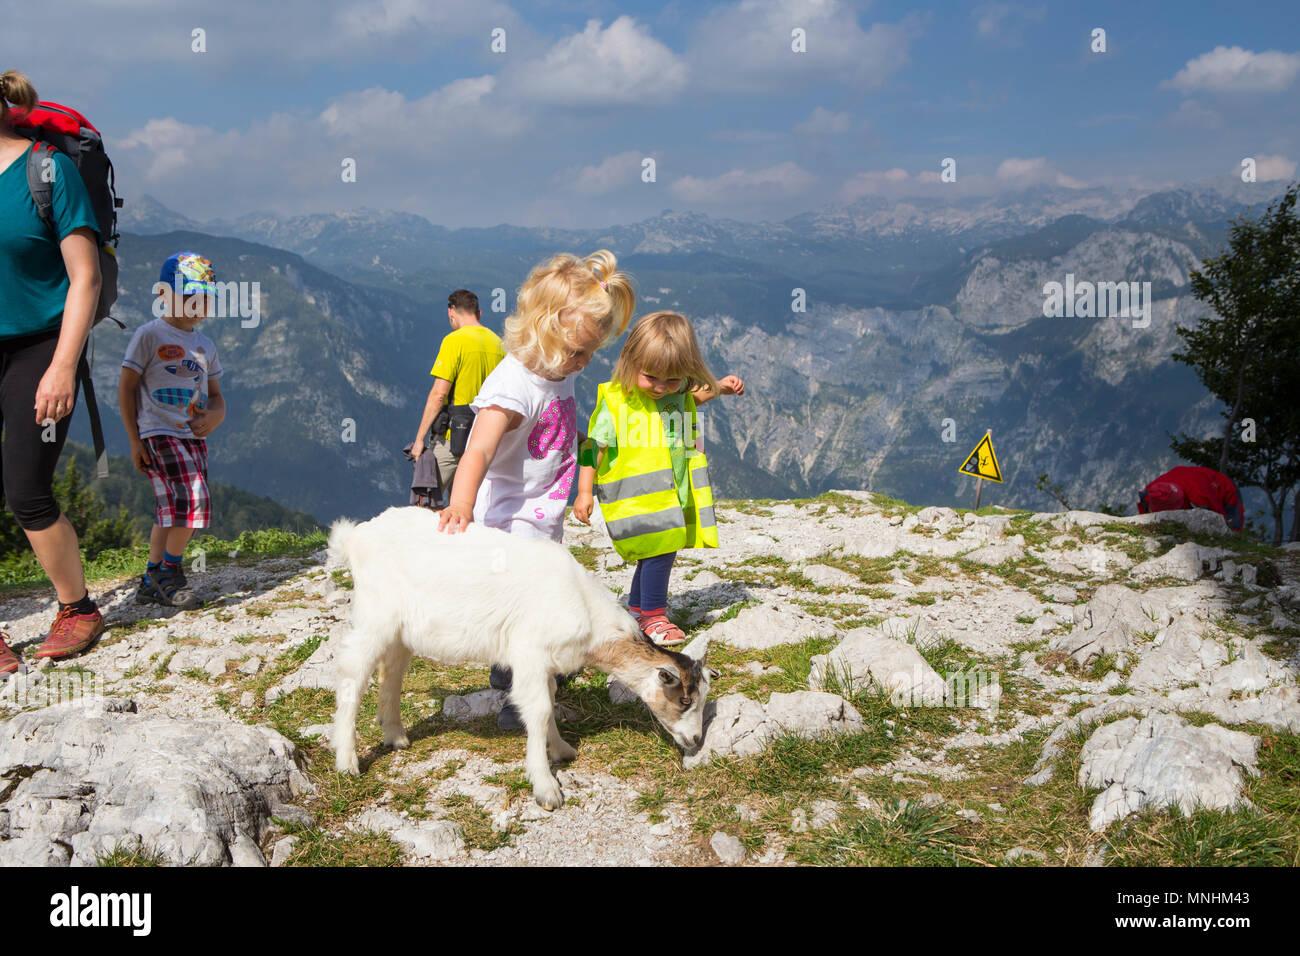 Two children cuddling baby goat at mount Vogel in Julian Alps, Slovenia - Stock Image